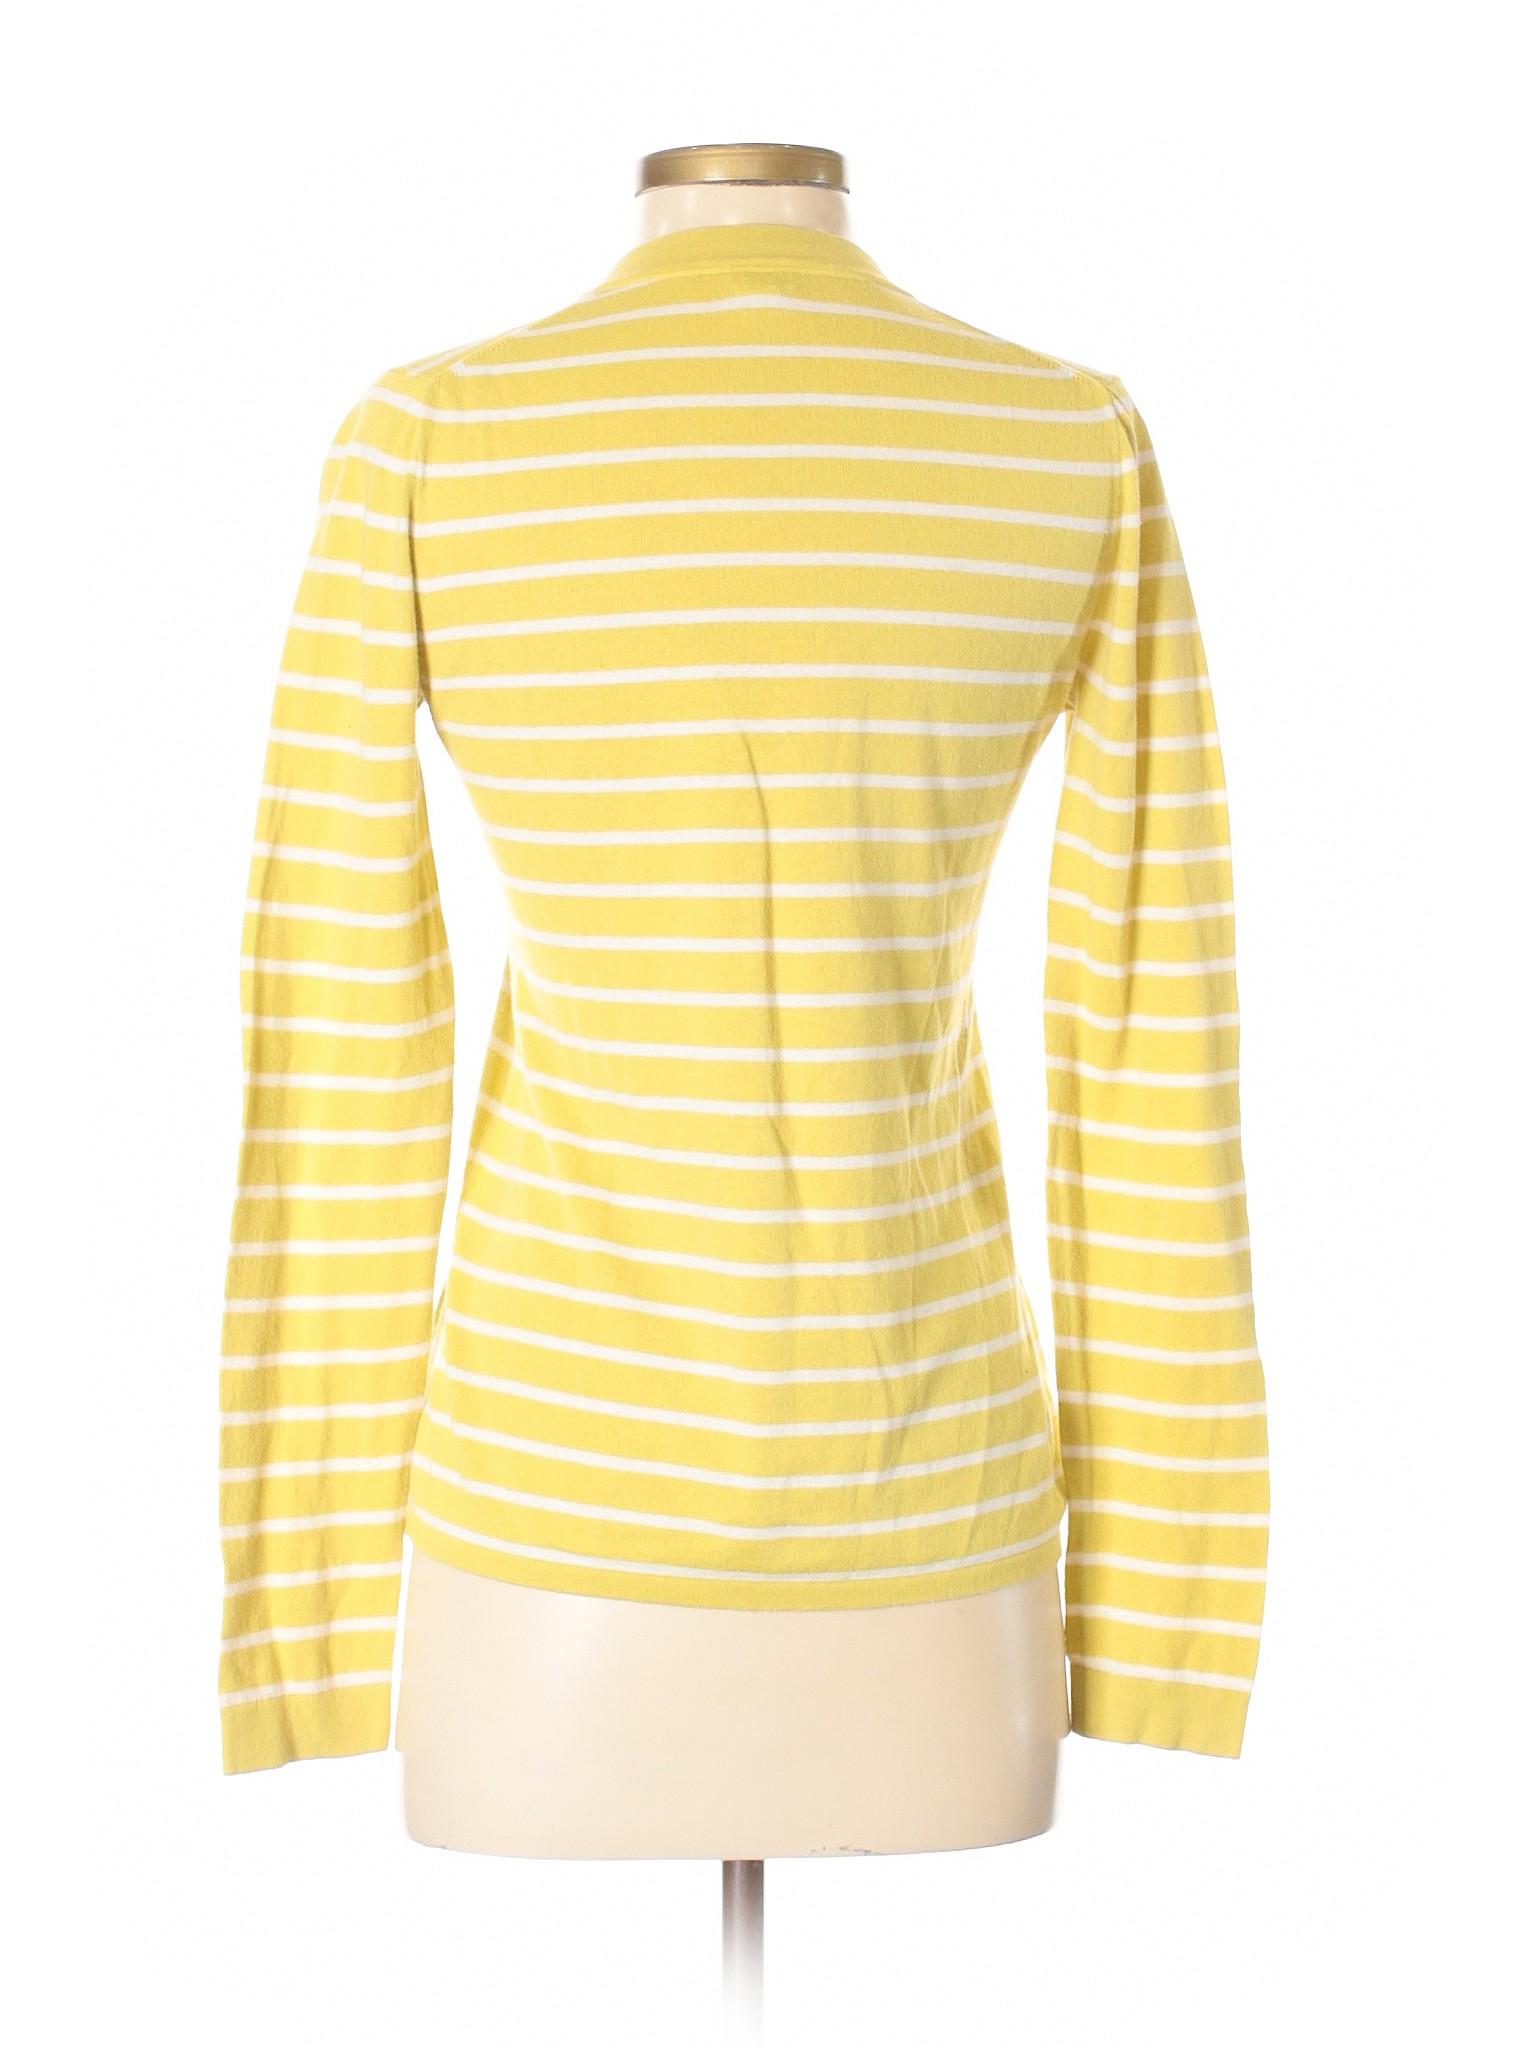 Crew Factory Pullover J Store Boutique Sweater Rqwf7f8c